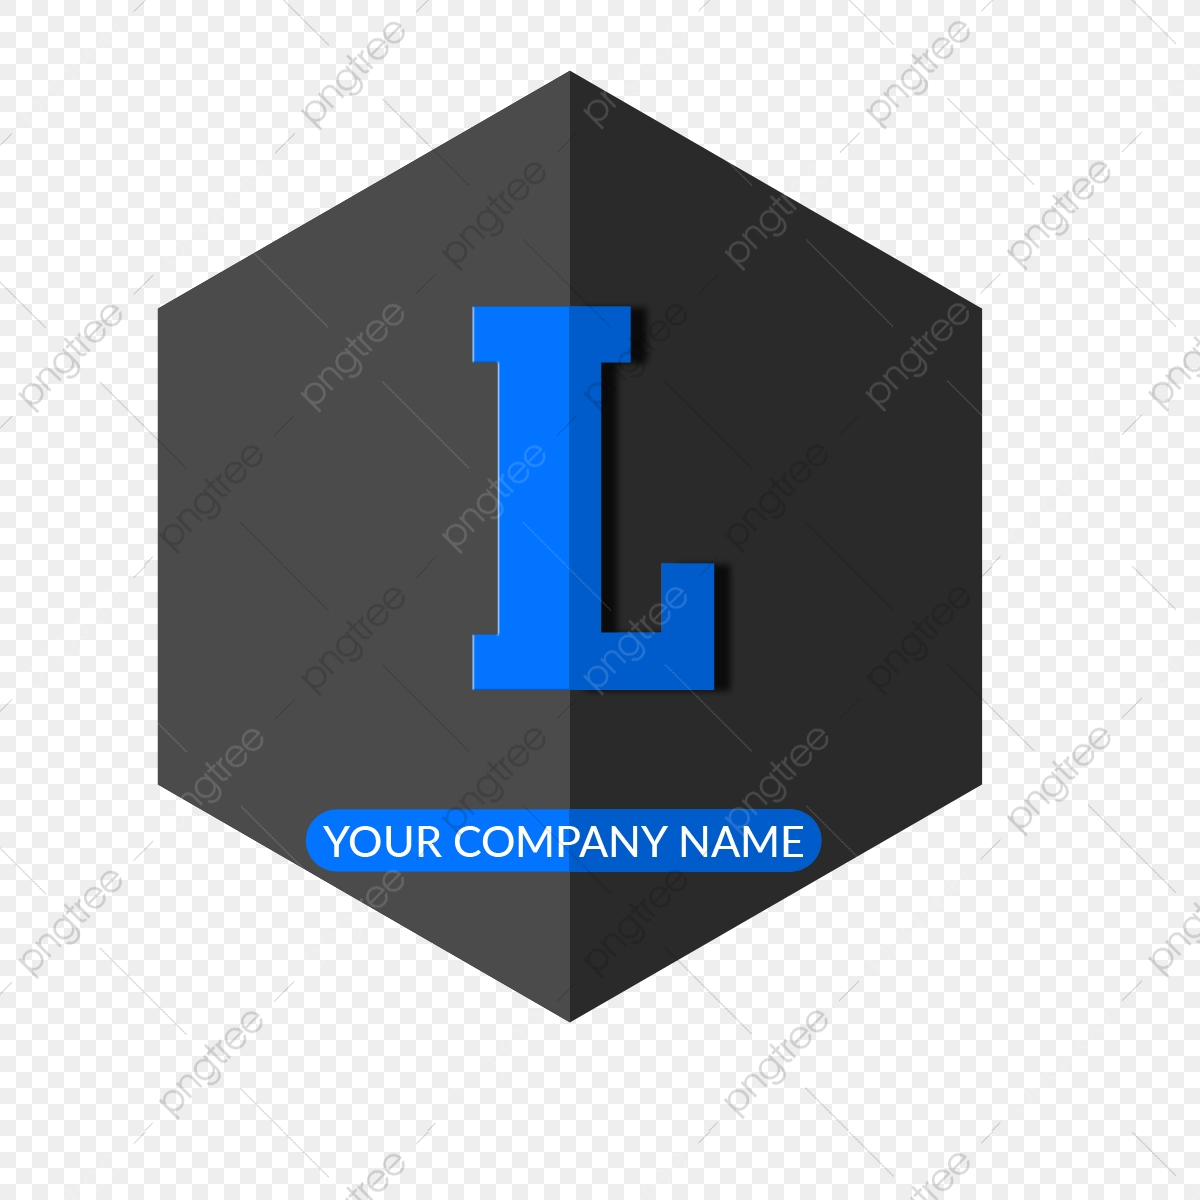 letter l logo design logo icons letter icons a png transparent clipart image and psd file for free download https pngtree com freepng letter l logo design 4059942 html